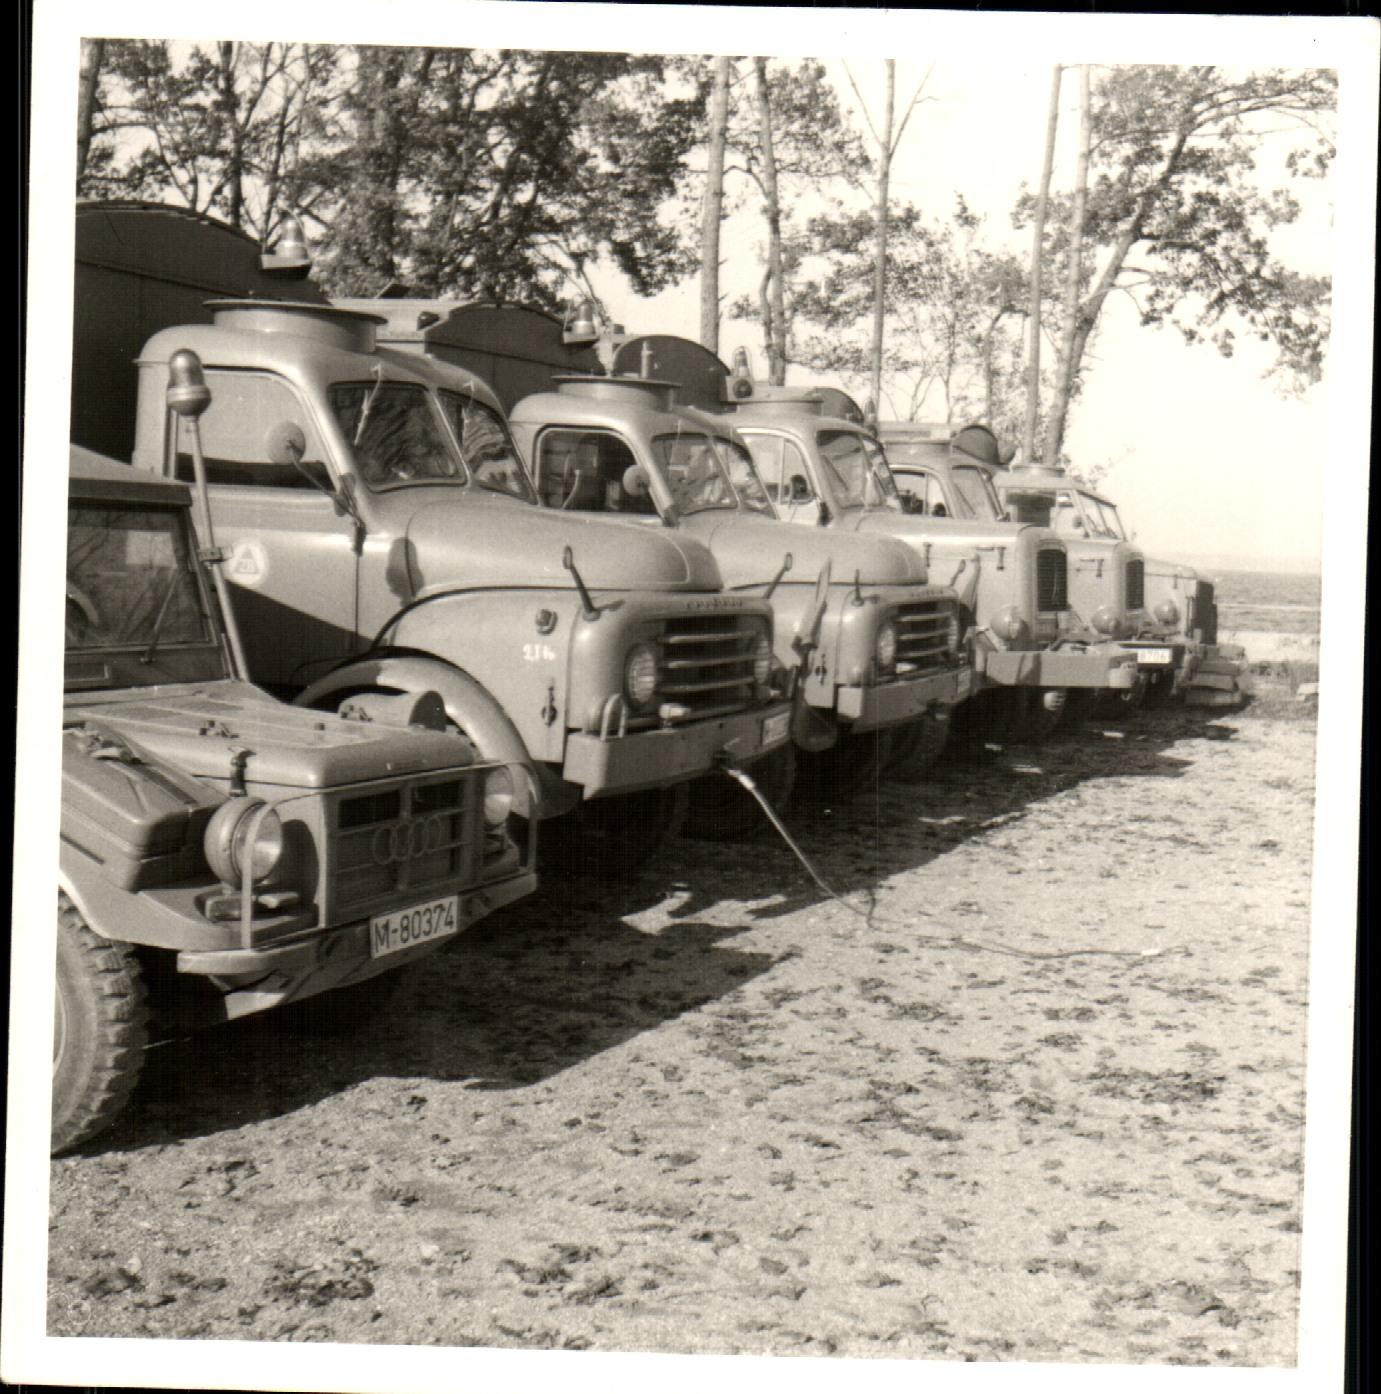 1960 rosenheim